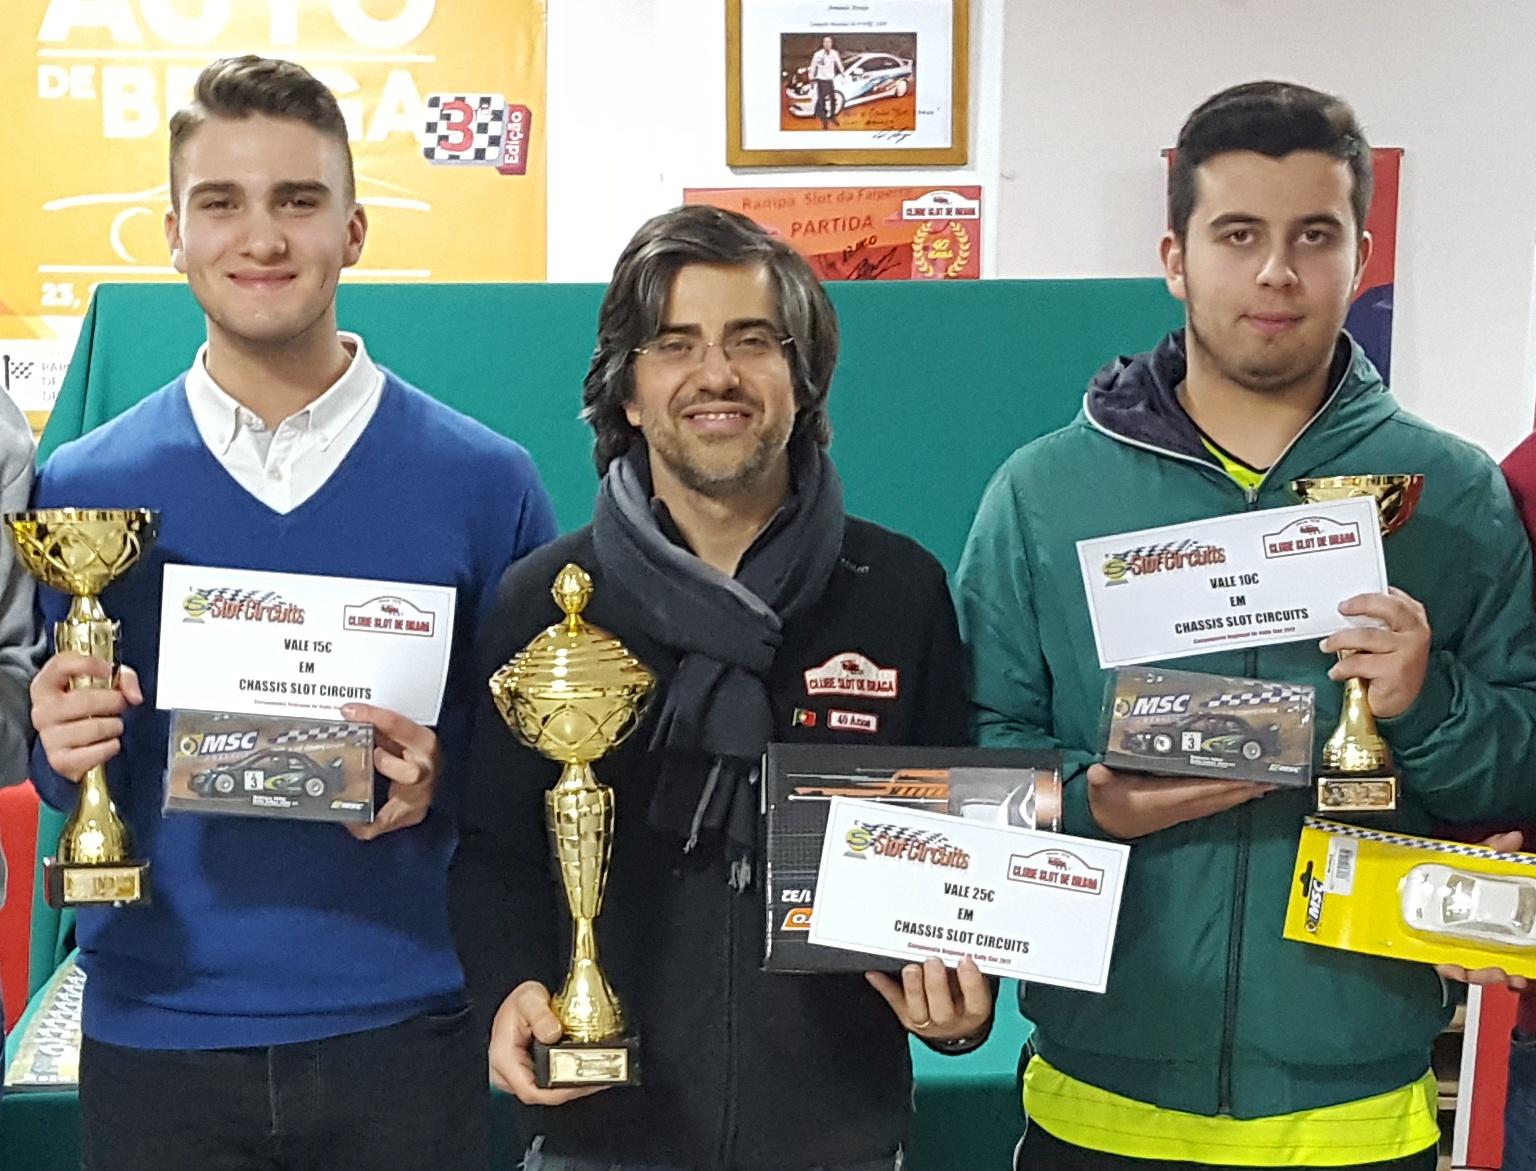 Campeonato Regional de Rally Slot 2017